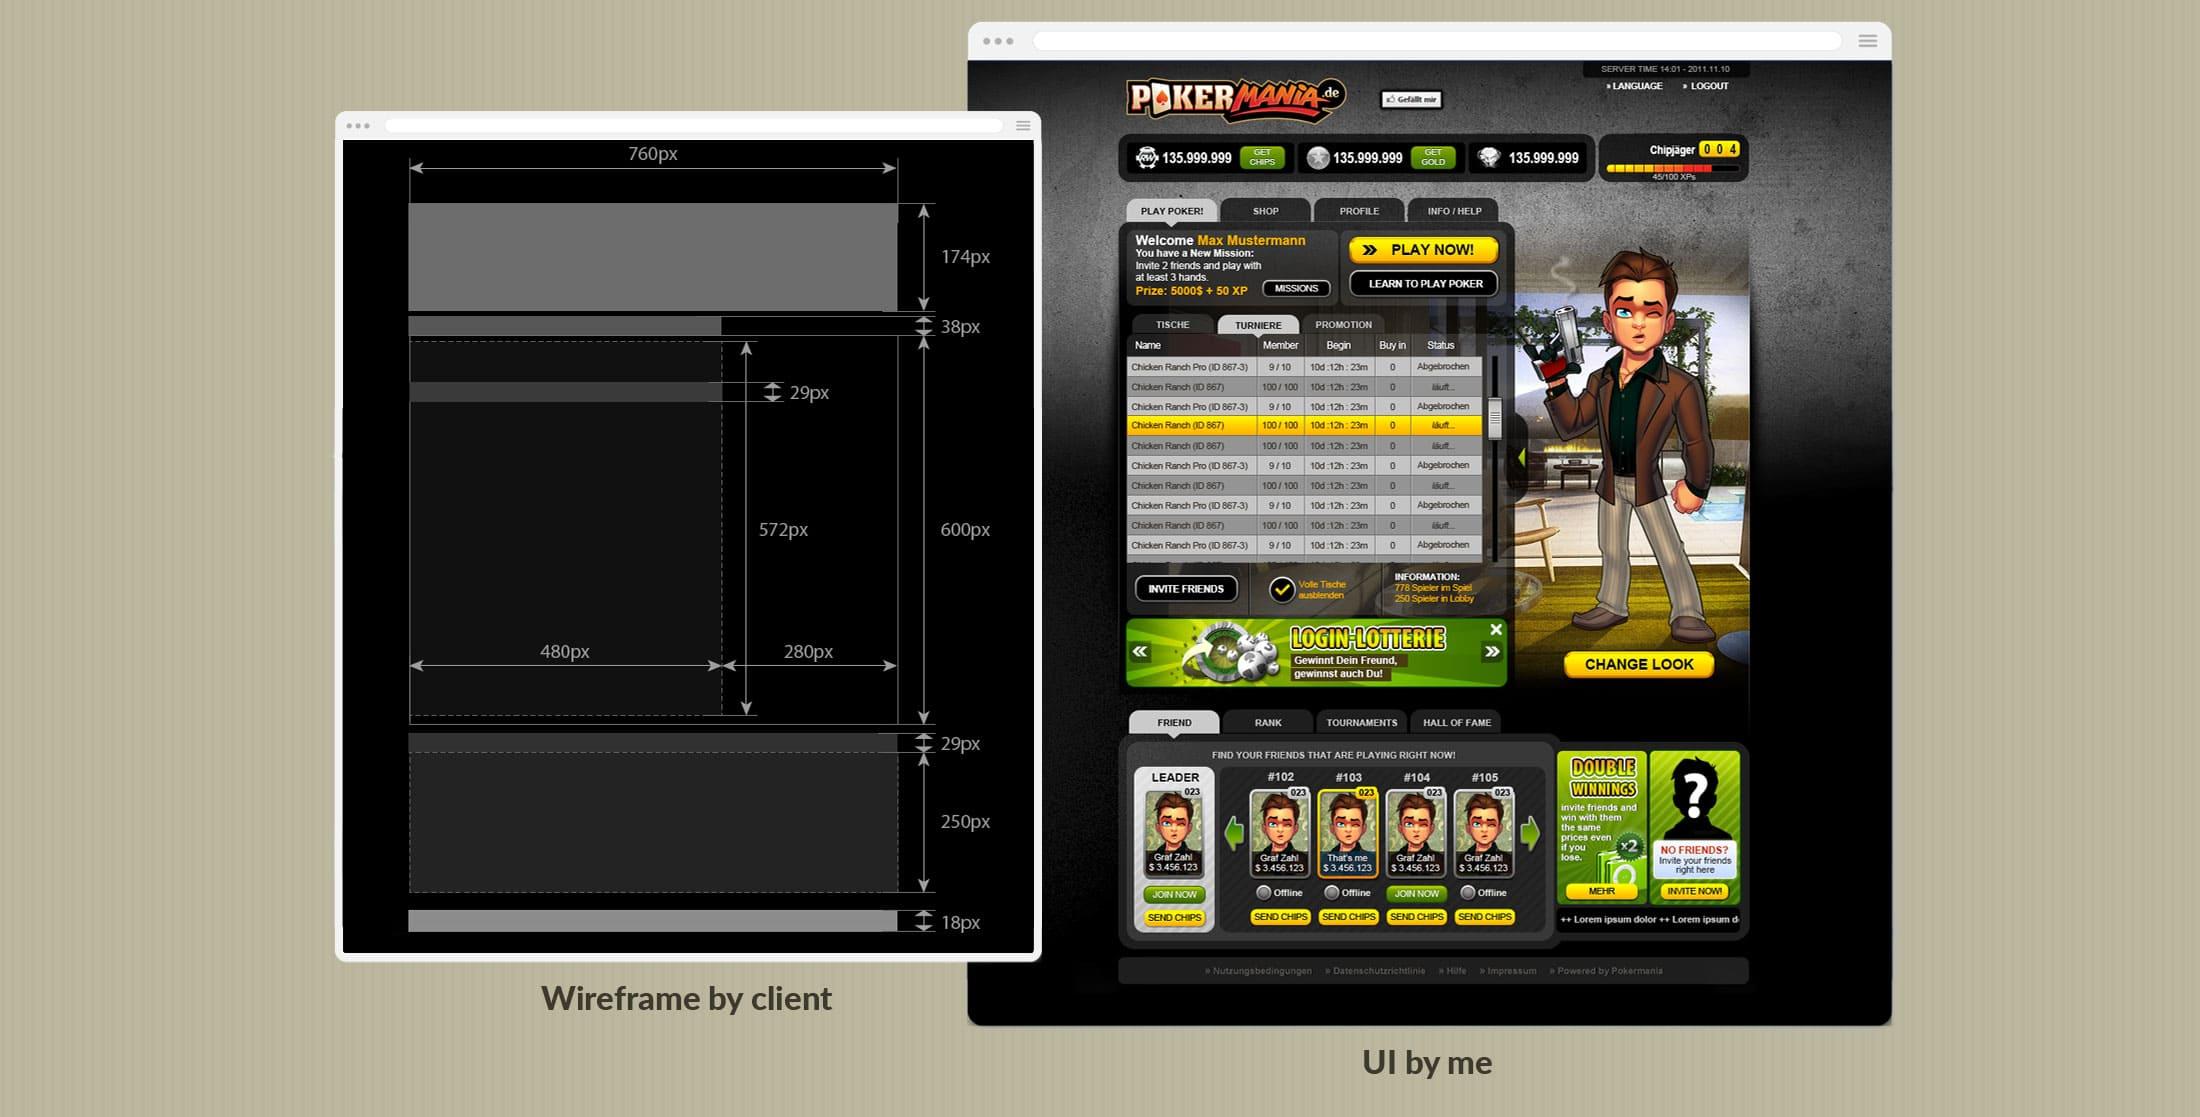 app wireframe to UI